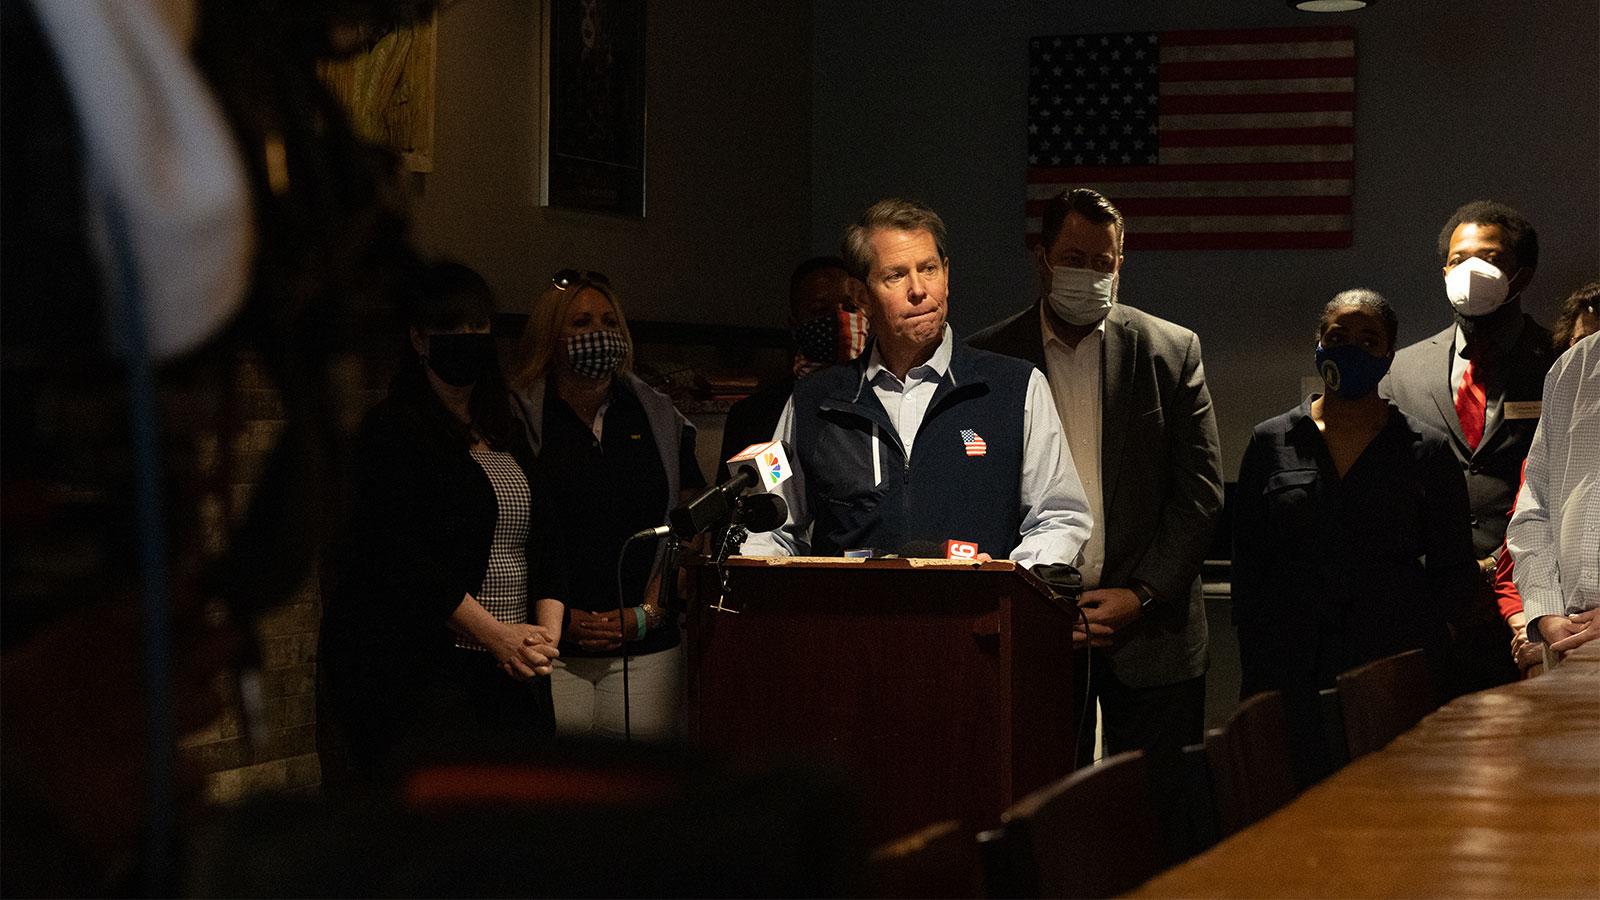 Georgia Republicans say DOJ suit against voting law could give Kemp political boost